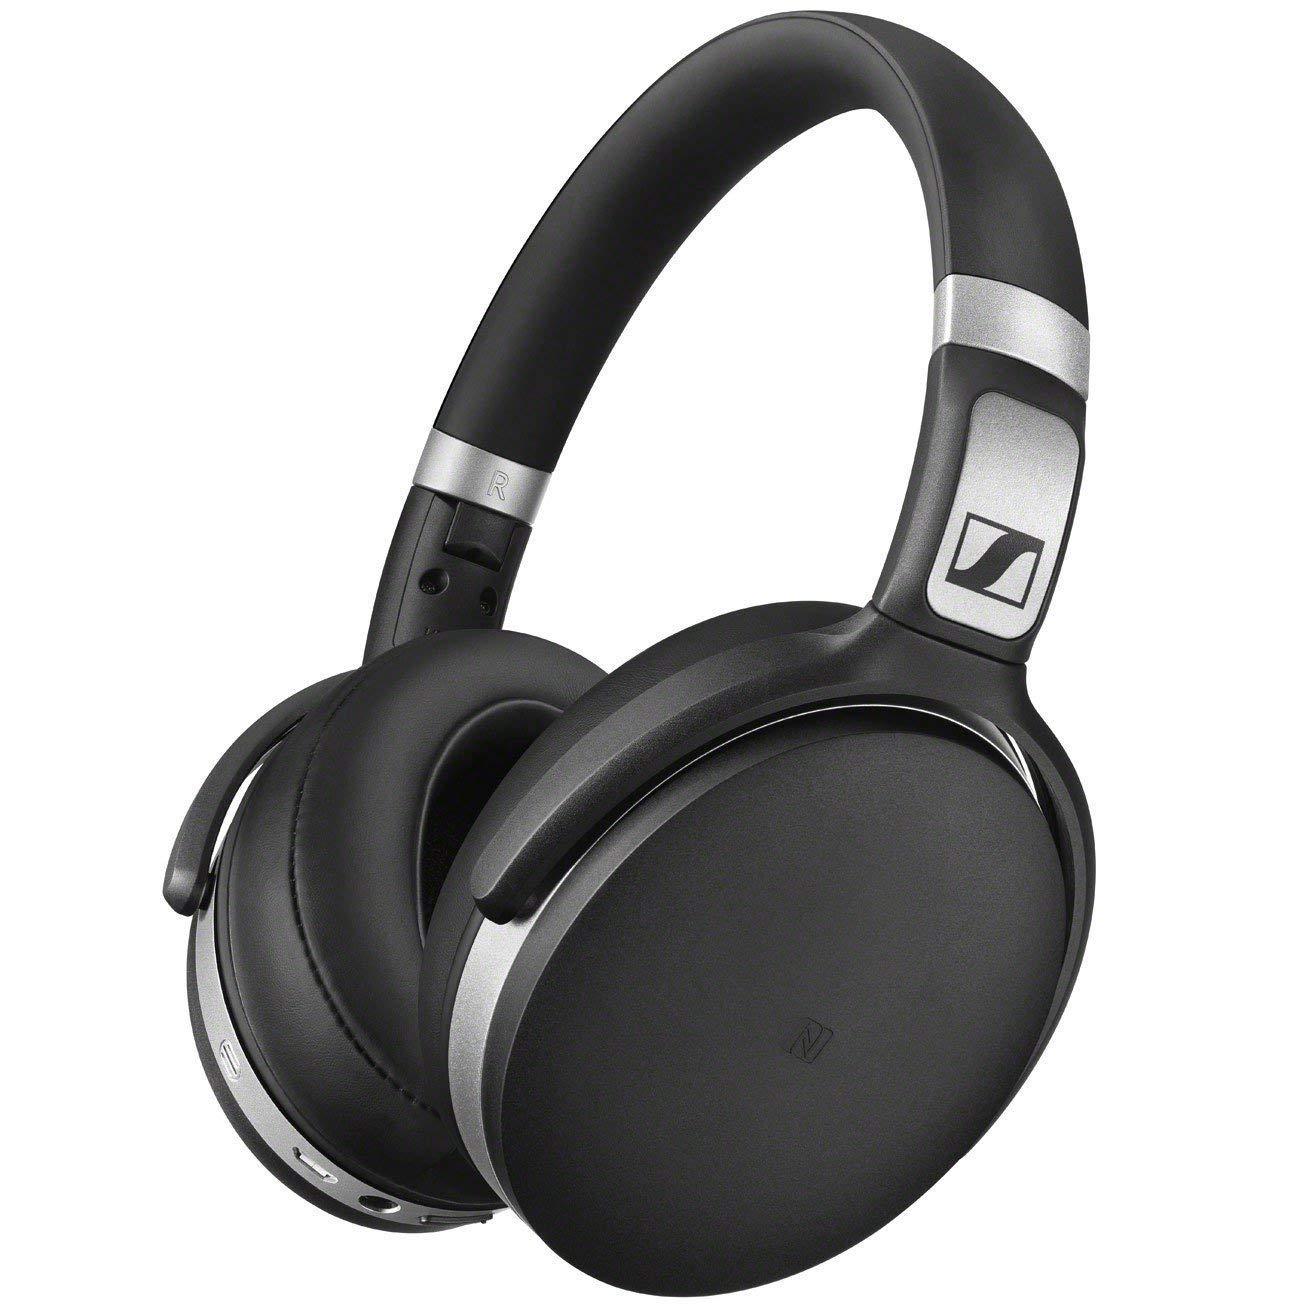 Sennheiser HD 4.50 BTNC, Over-Ear Wireless Headphone with Active Noise Cancellation - Black, £89.99 at amazon